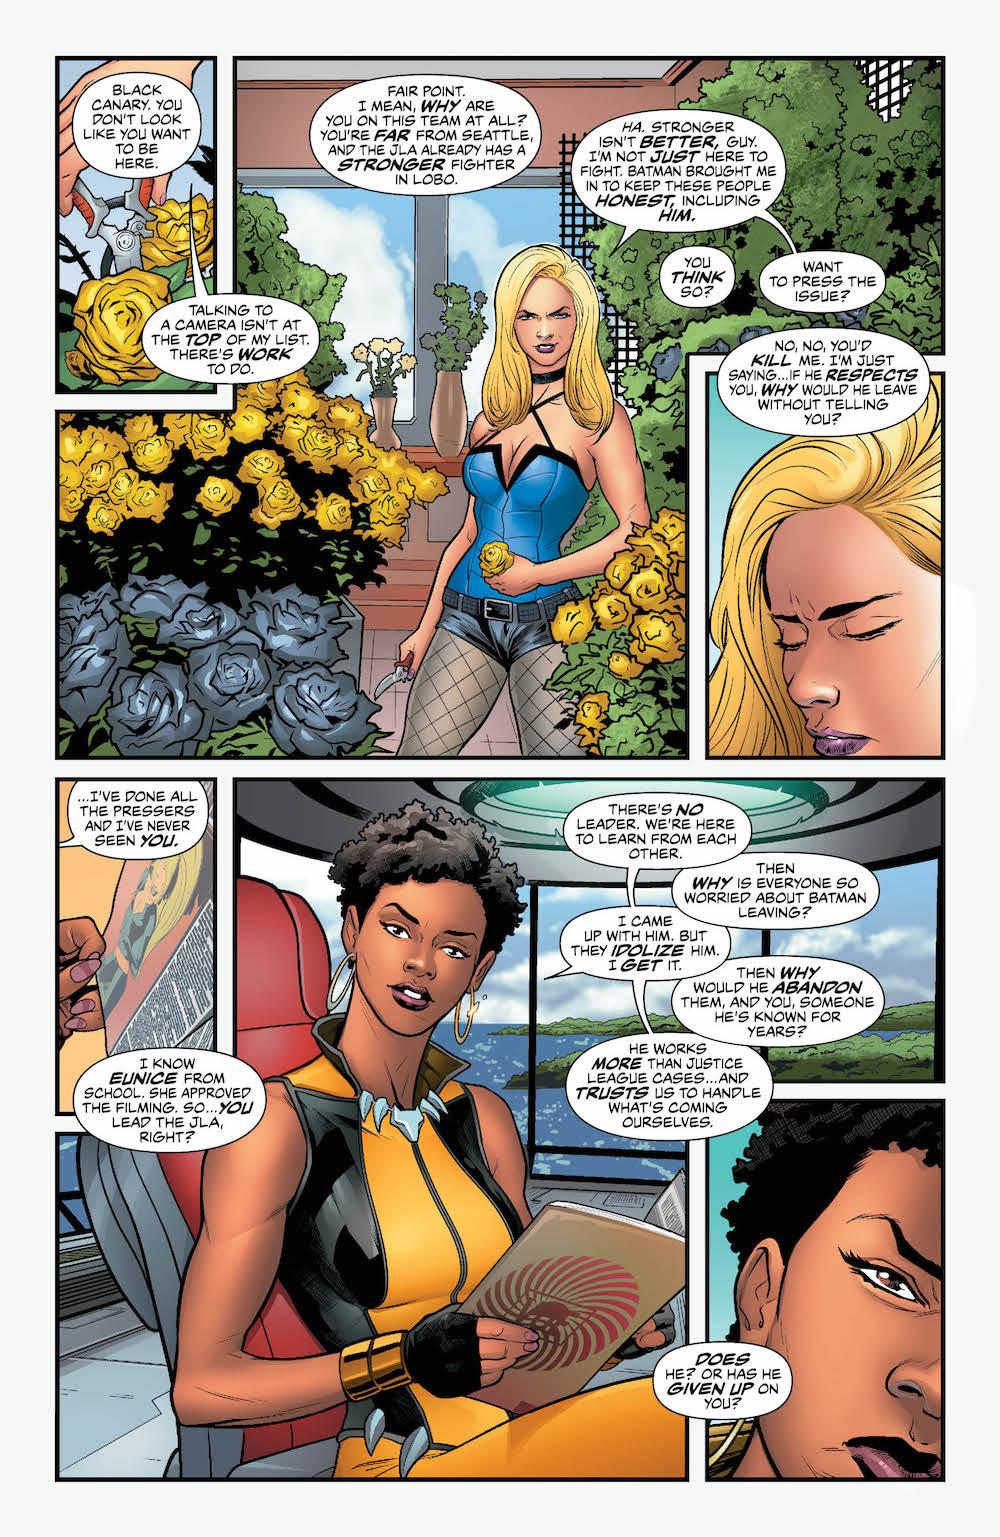 Justice League, Vixen, Black Canary 2017